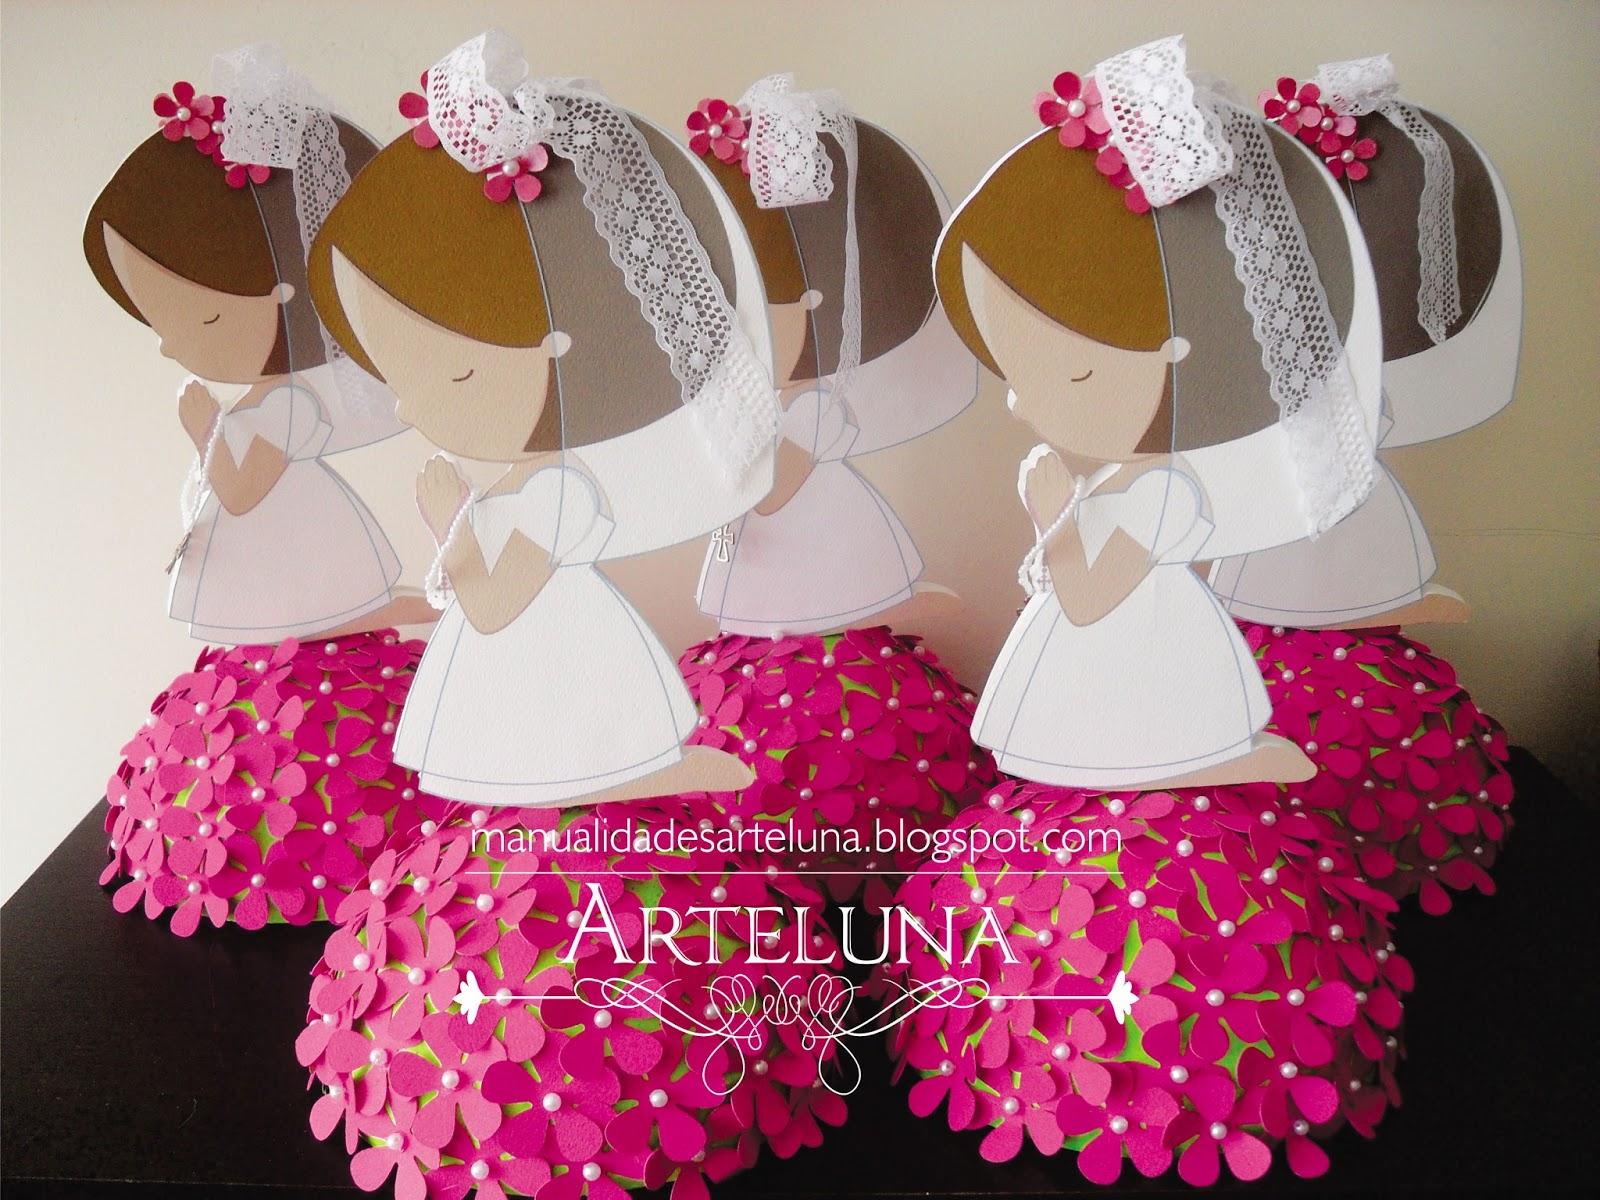 Decoration42 decoracion de mesas de comunion - Adornos mesa comunion ...